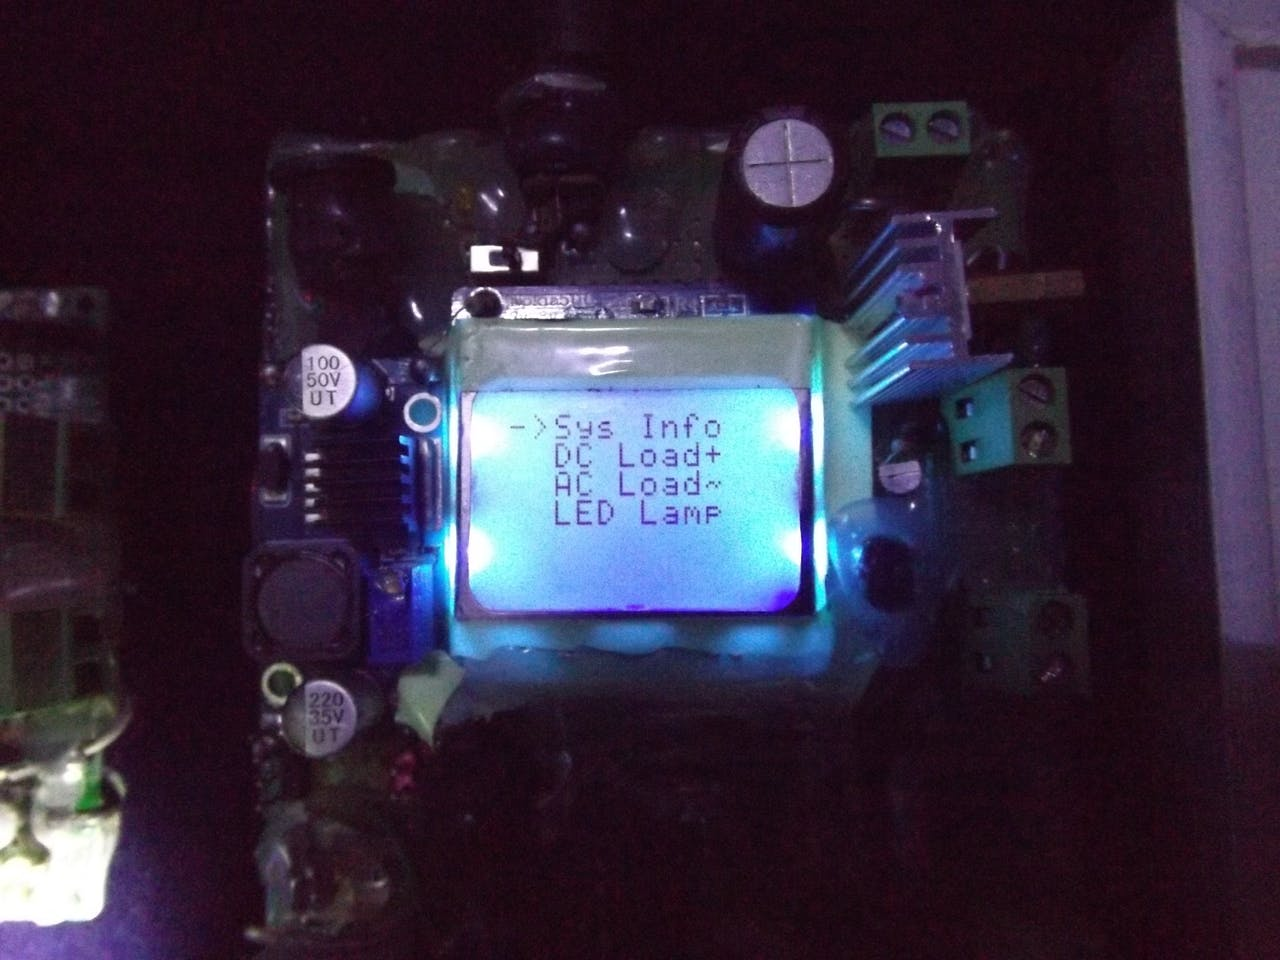 Integrated Solar Chargecontroller Inverter Powerbank Lamp Controlling Dc Motors Using Avr Microcontrollers Vishnu39s Blogs